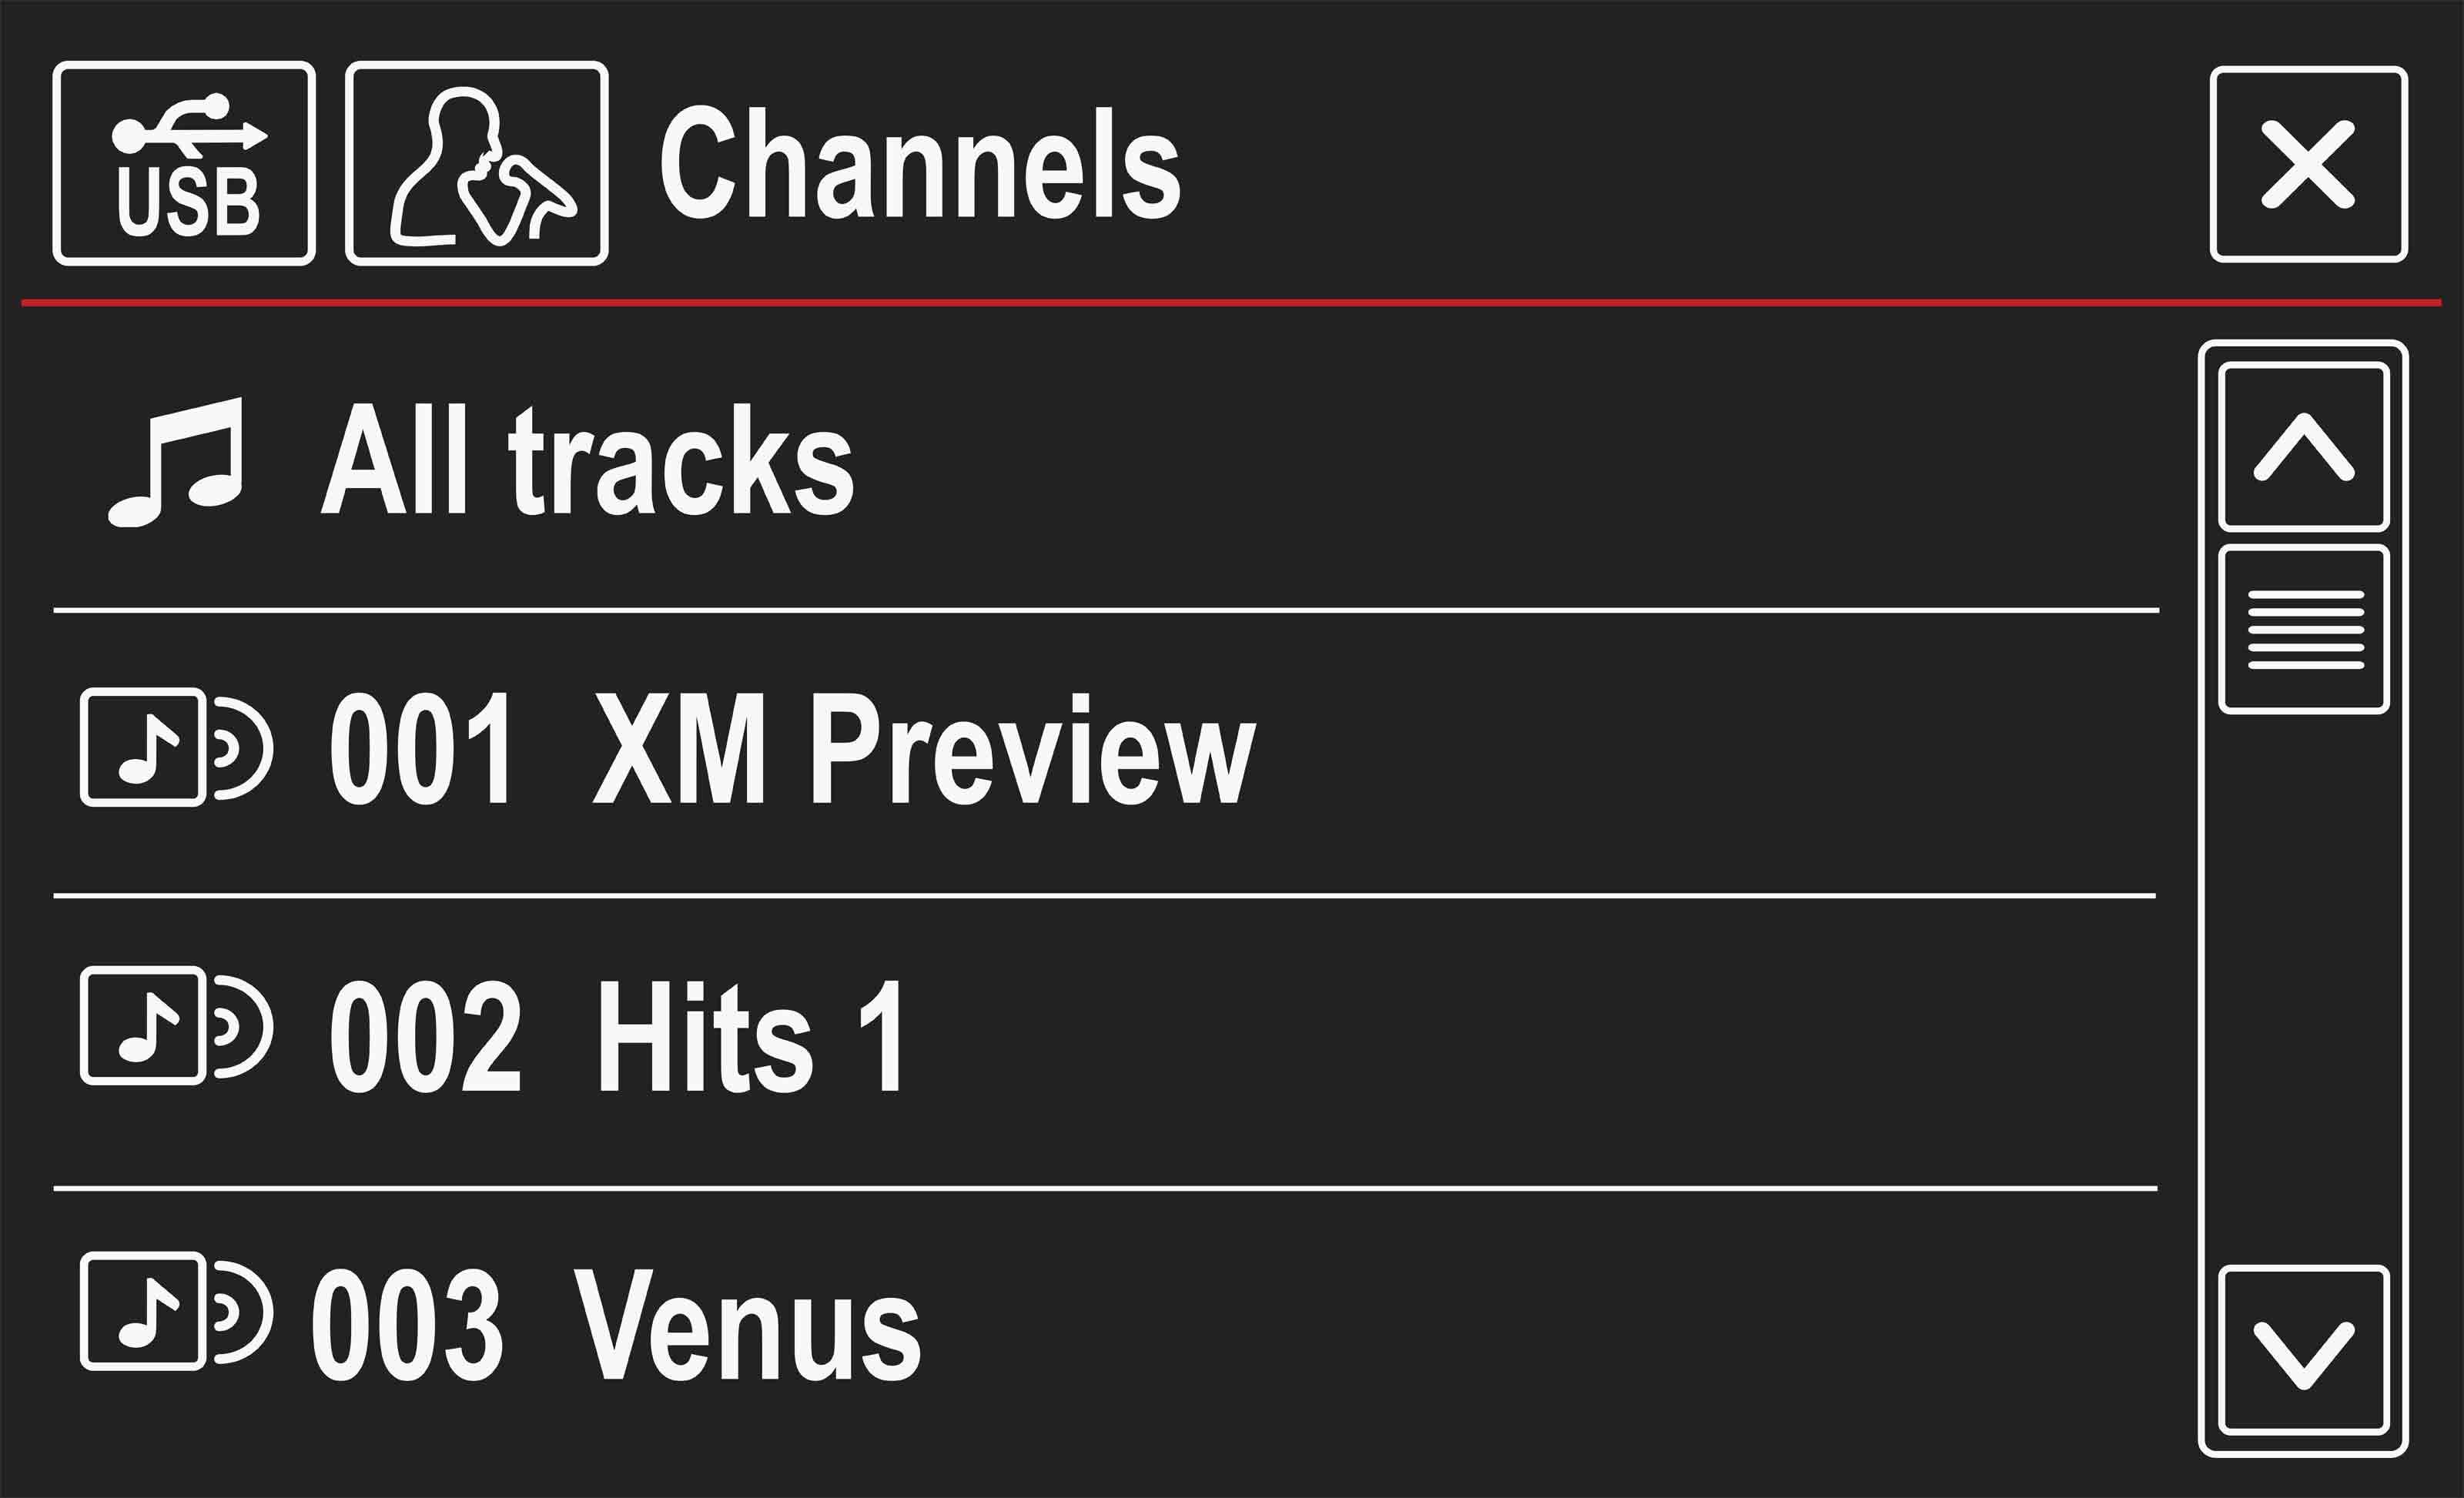 Vw Channel List Gsr Sat Radio Nav Display